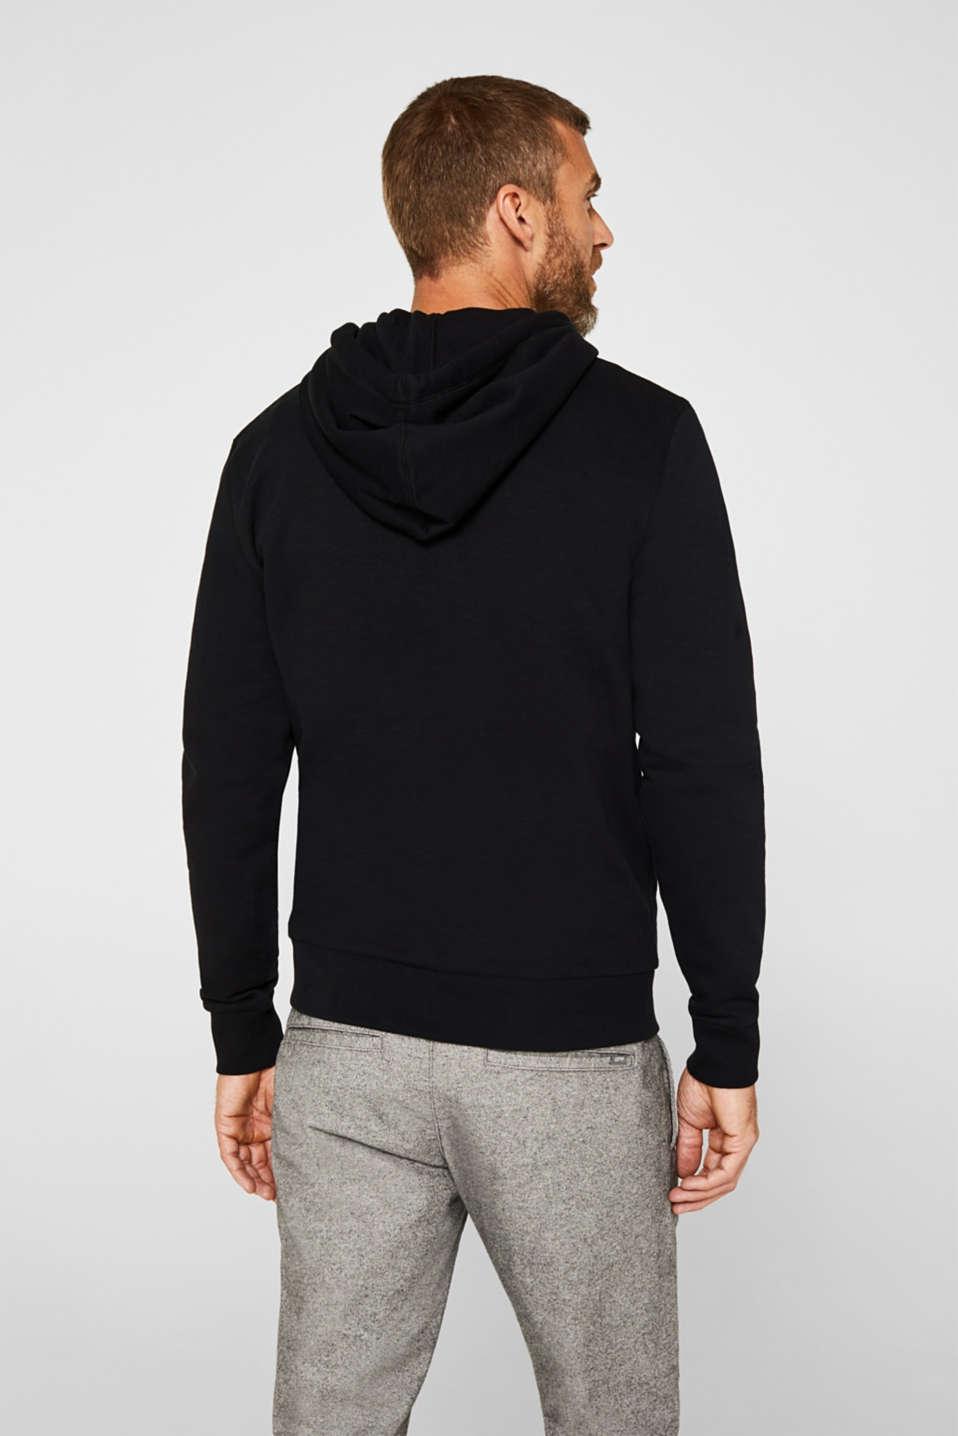 Sweatshirt cardigan with hood, 100% cotton, BLACK, detail image number 3